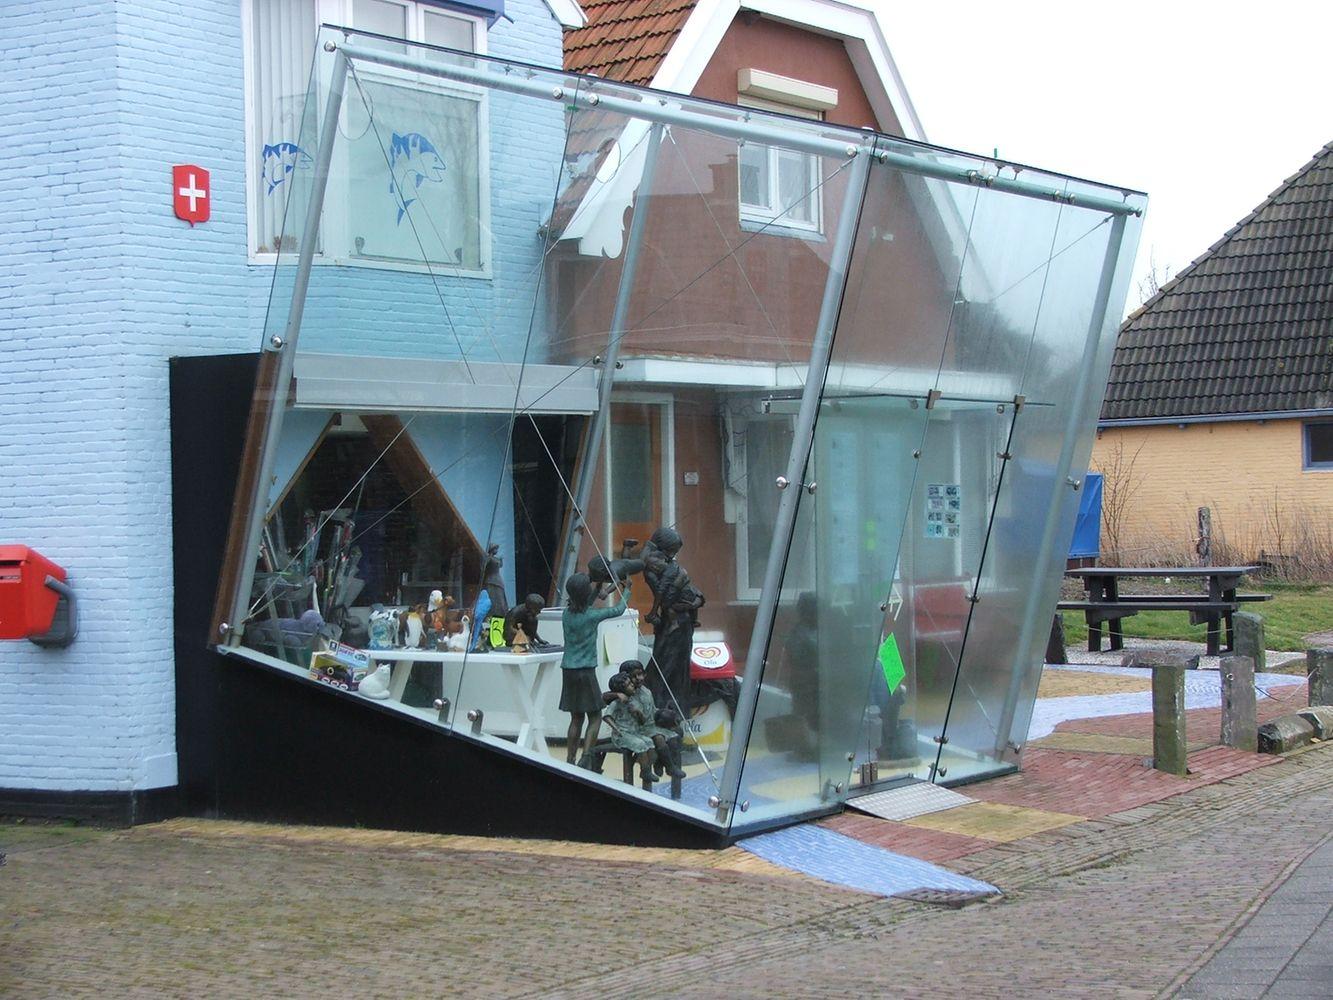 Glazen kubus Zurich door D&O Franeker